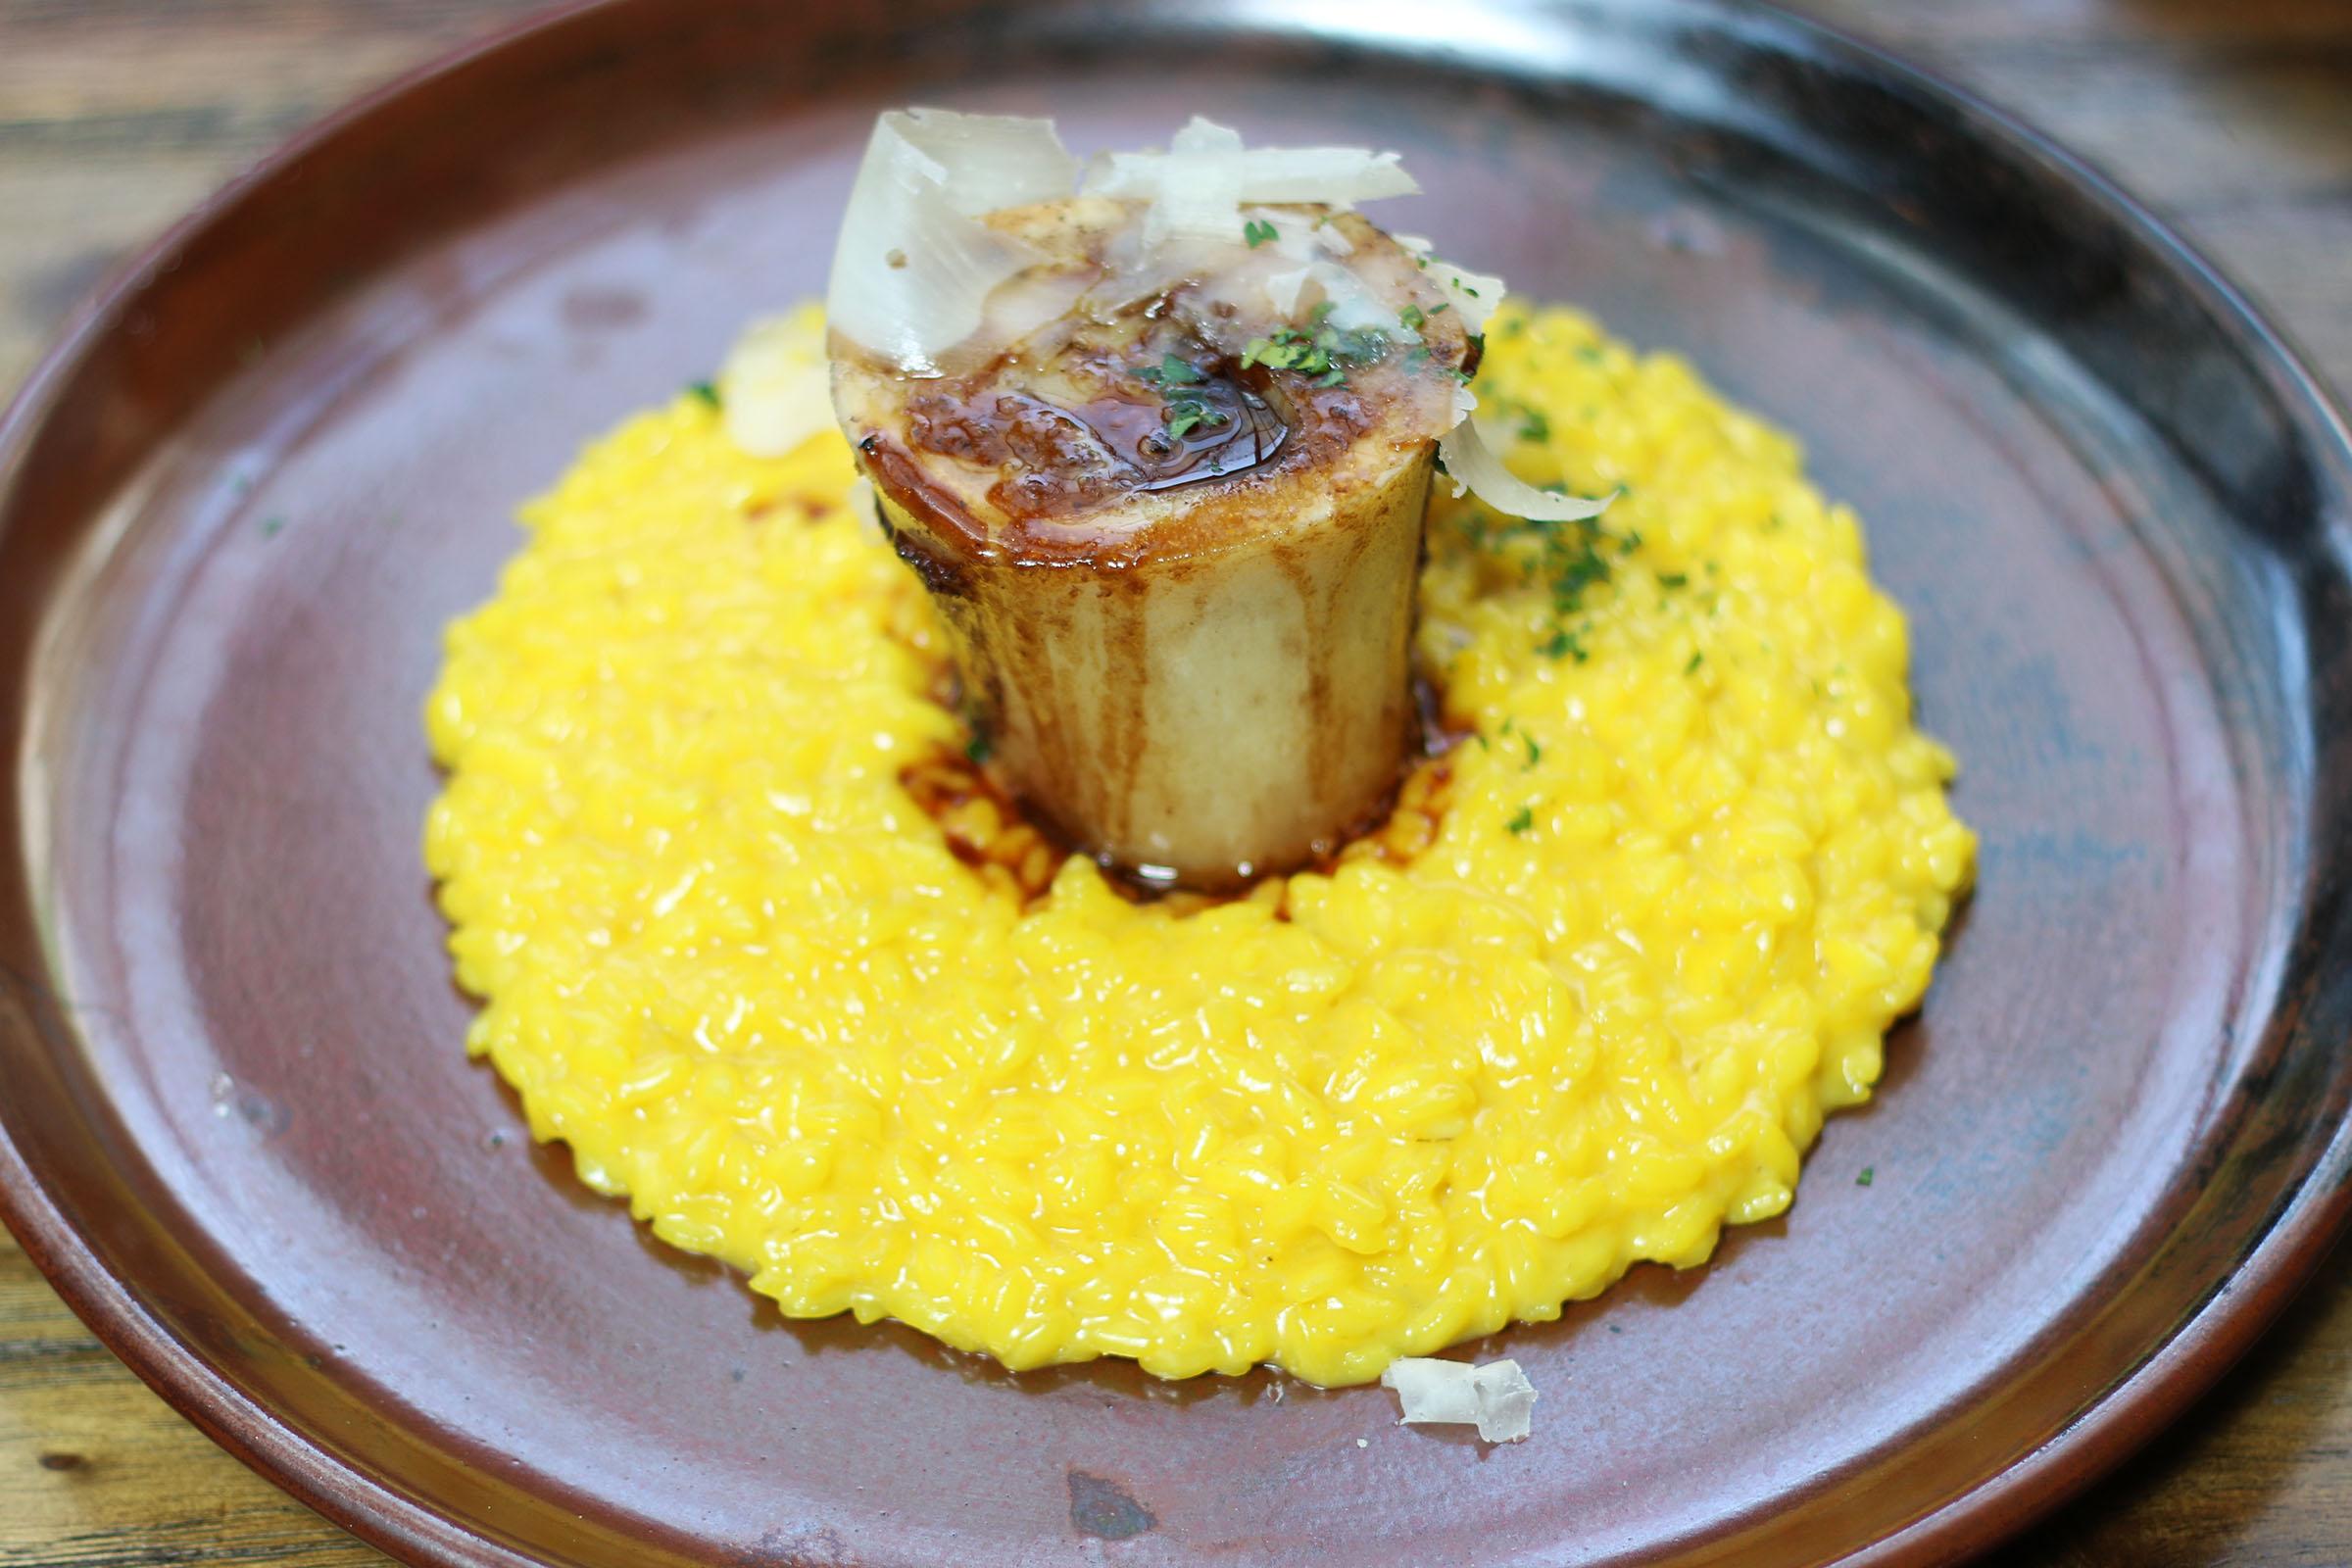 MILANESE Risotto: vialone nano igp rice, saffron, wood oven roasted bone marrow, raspadura